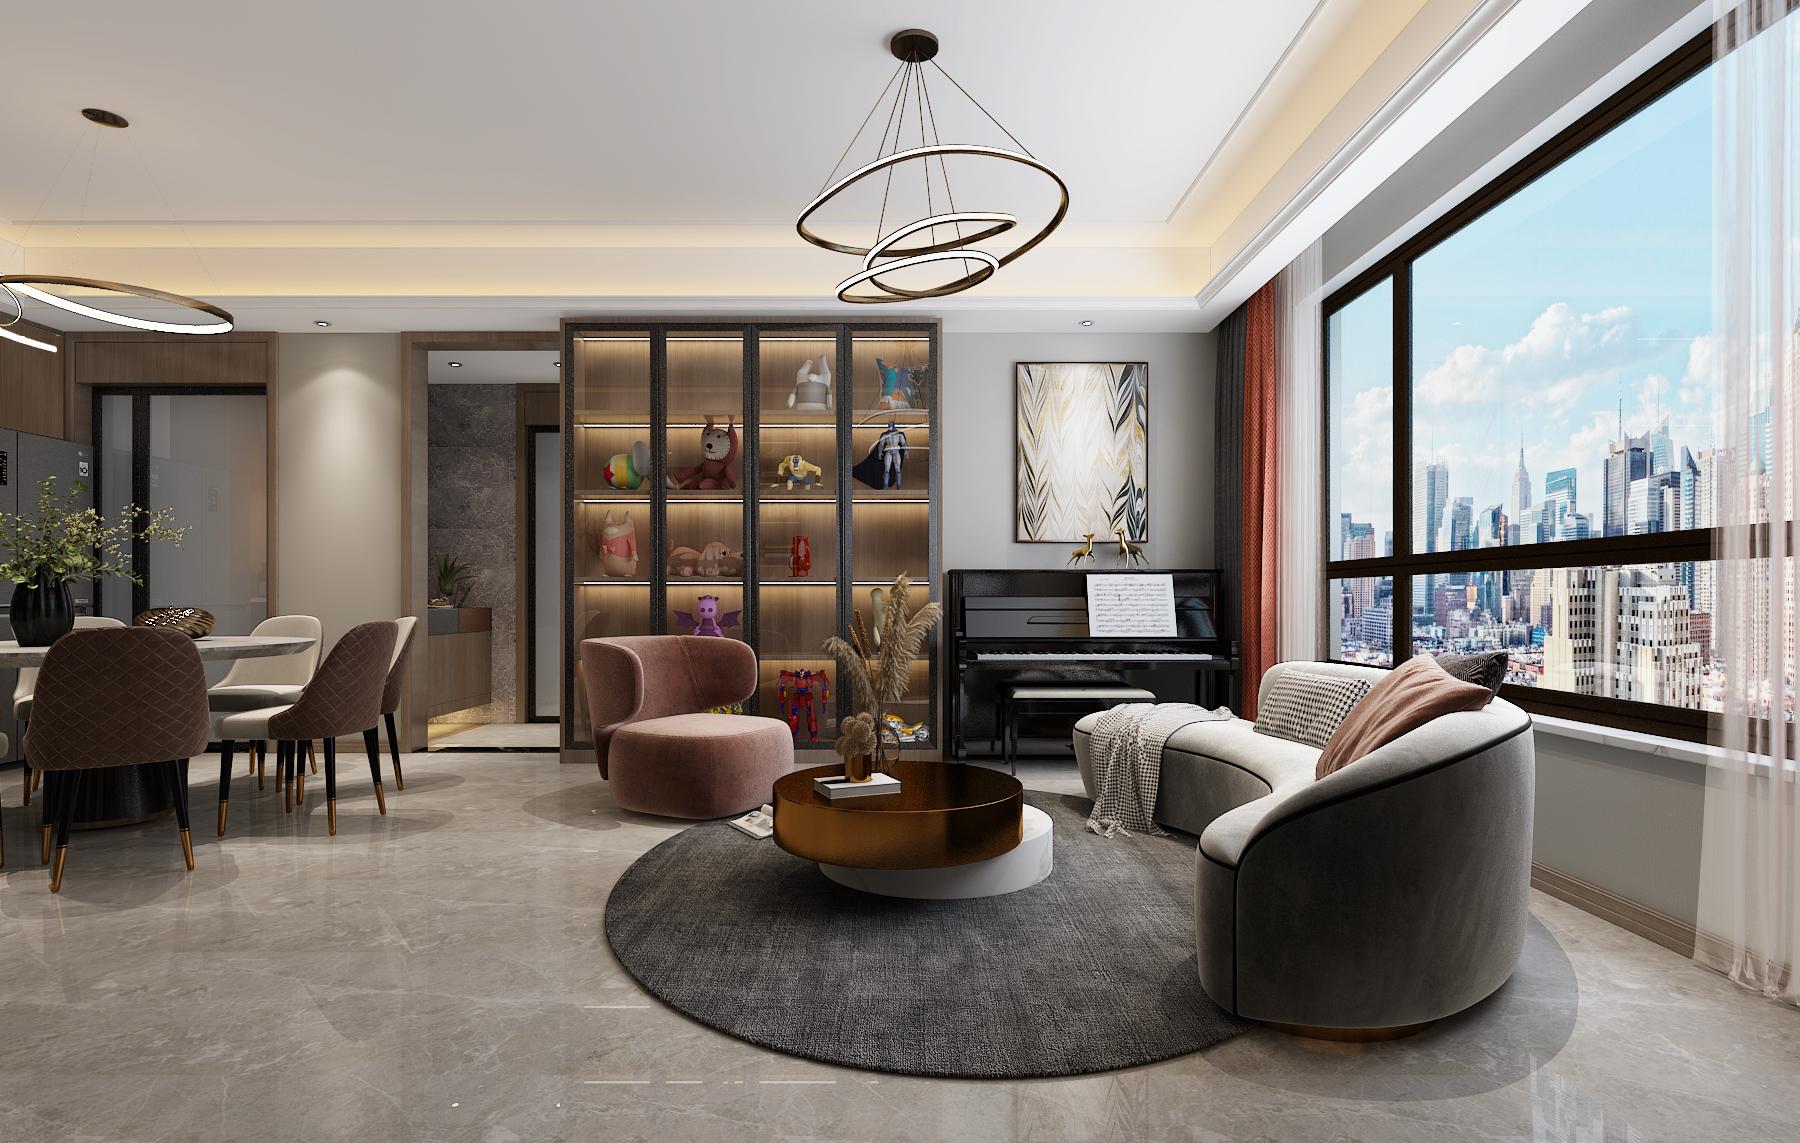 <span style='color: #ff0000'>新房裝修</span>如何布局?柏悅公館140㎡現代輕奢風格學習一下